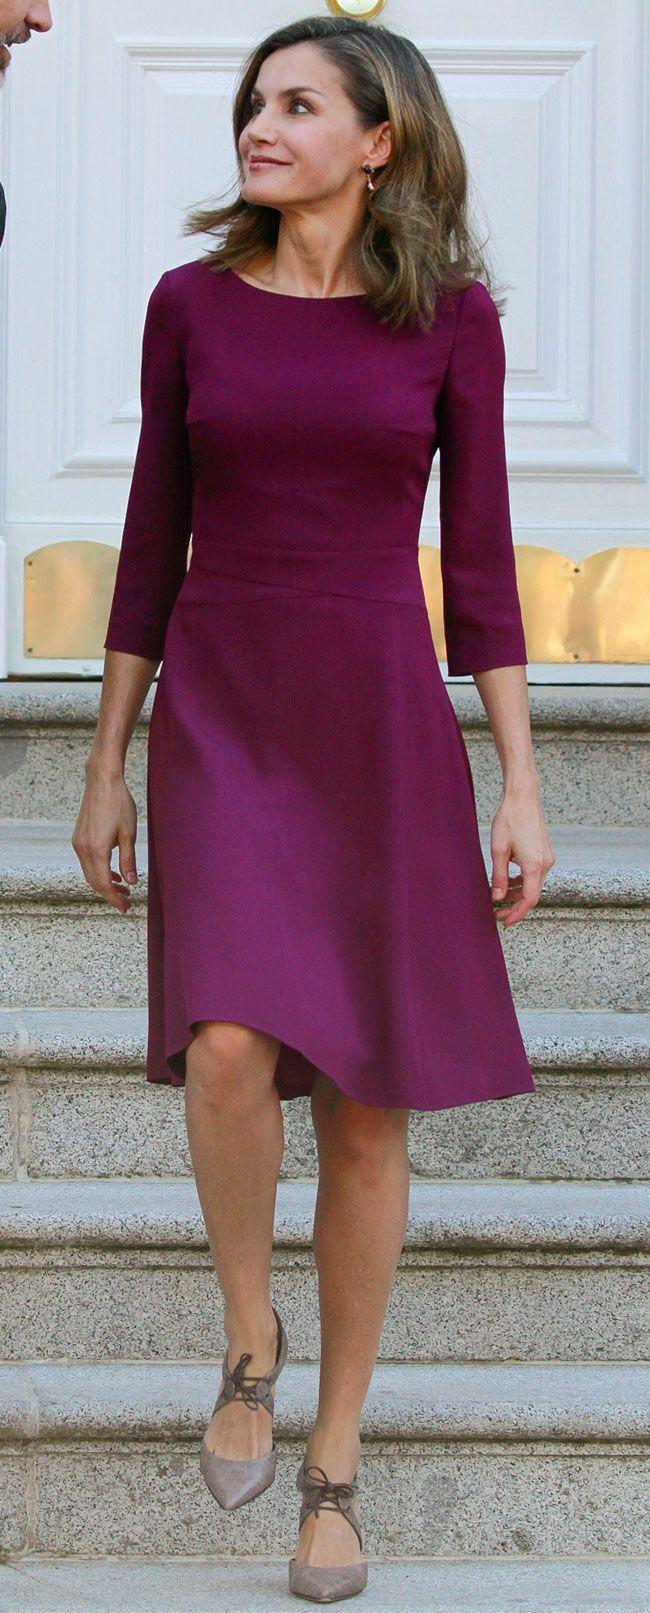 Pin de Ana Cristina en vestido rojo | Pinterest | Vestiditos, Reinas ...